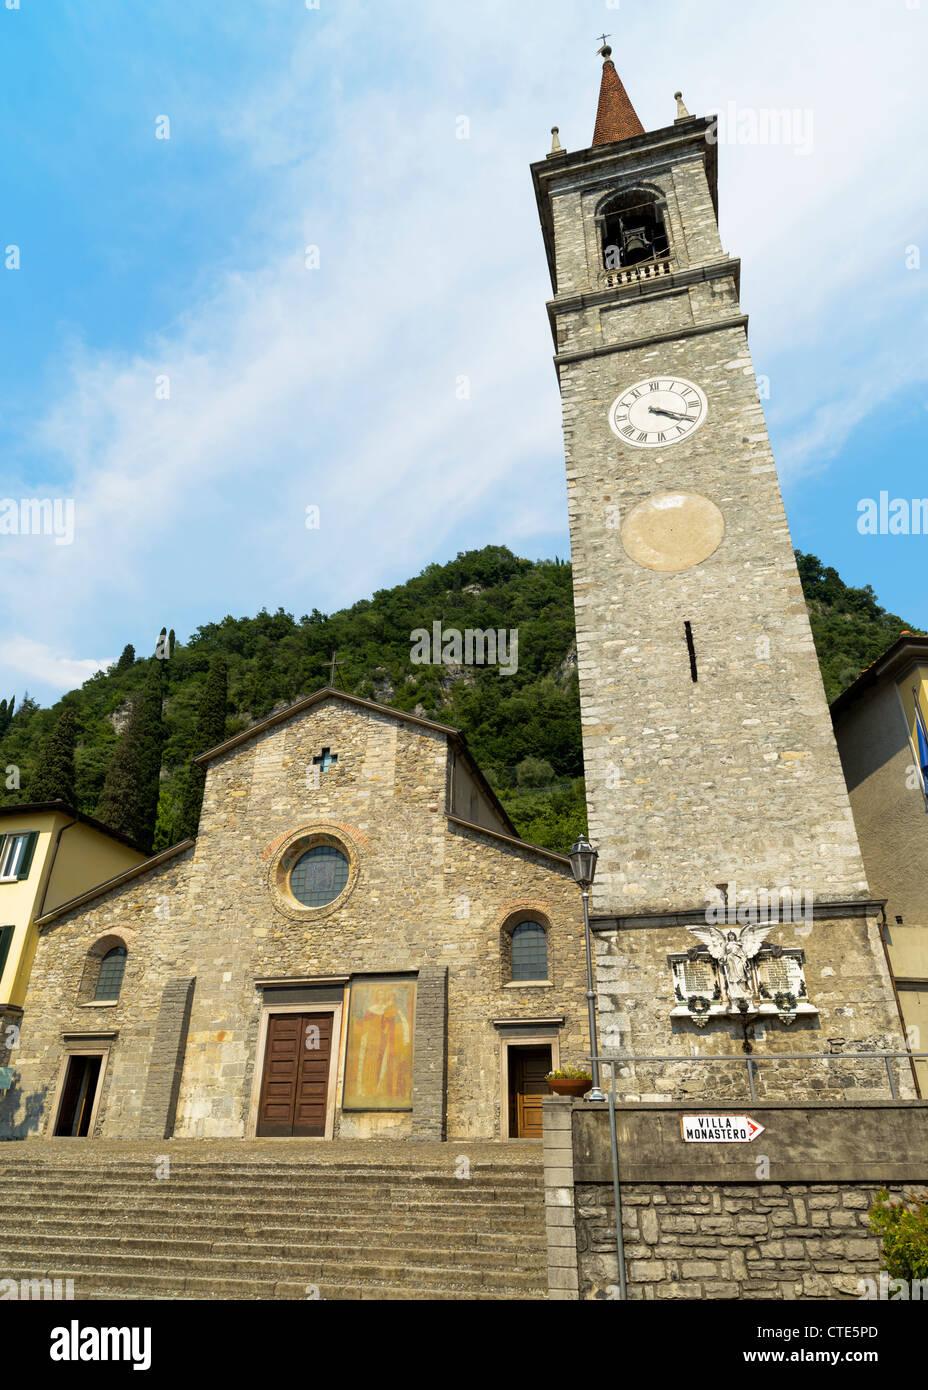 Varenna,Lake Como,Italy,Europe - Stock Image